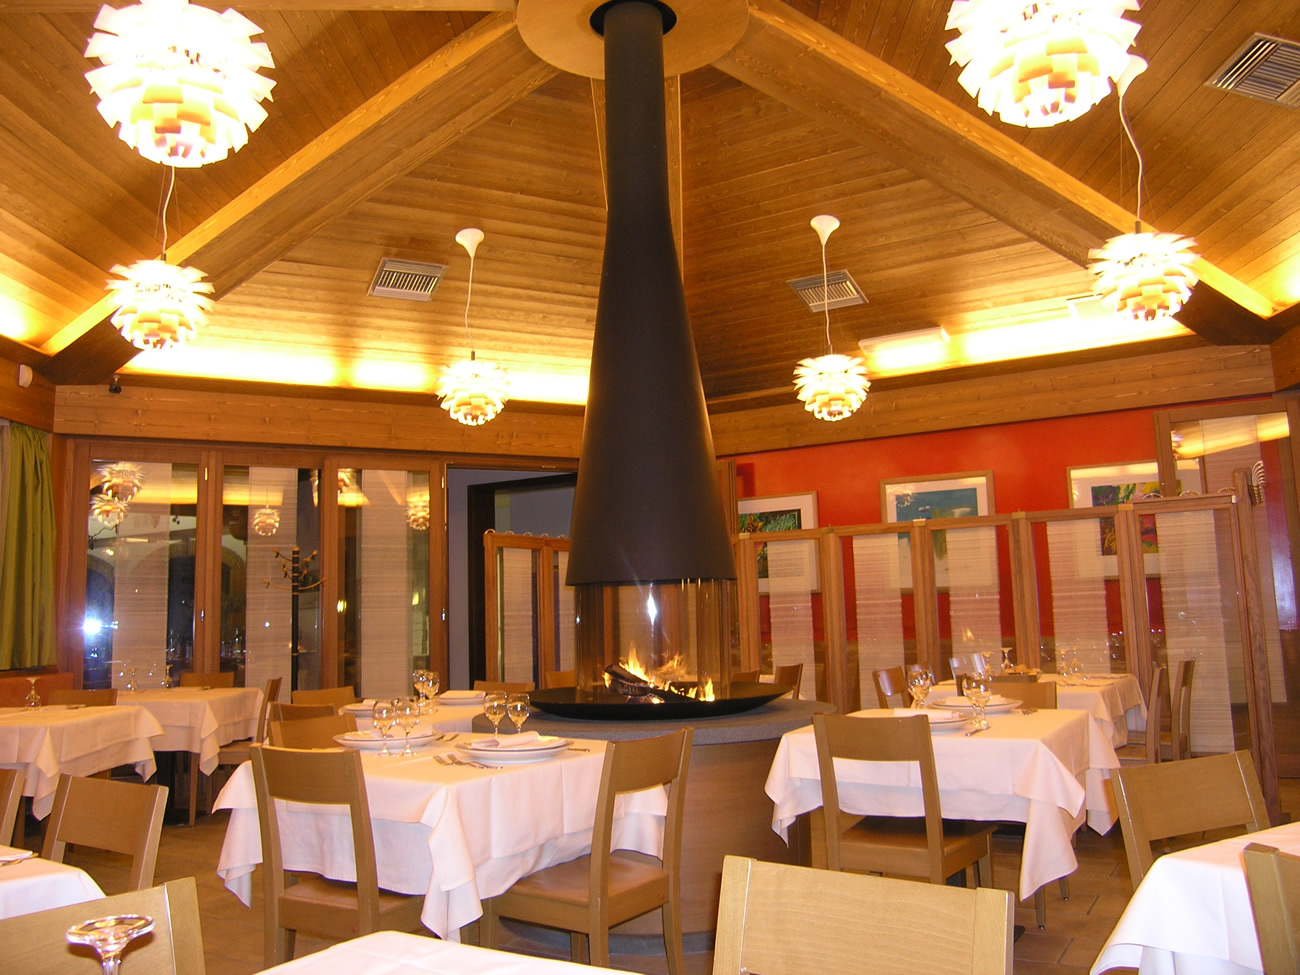 Arredamento ristorante moderno aq75 regardsdefemmes for Arredamenti moderni per interni